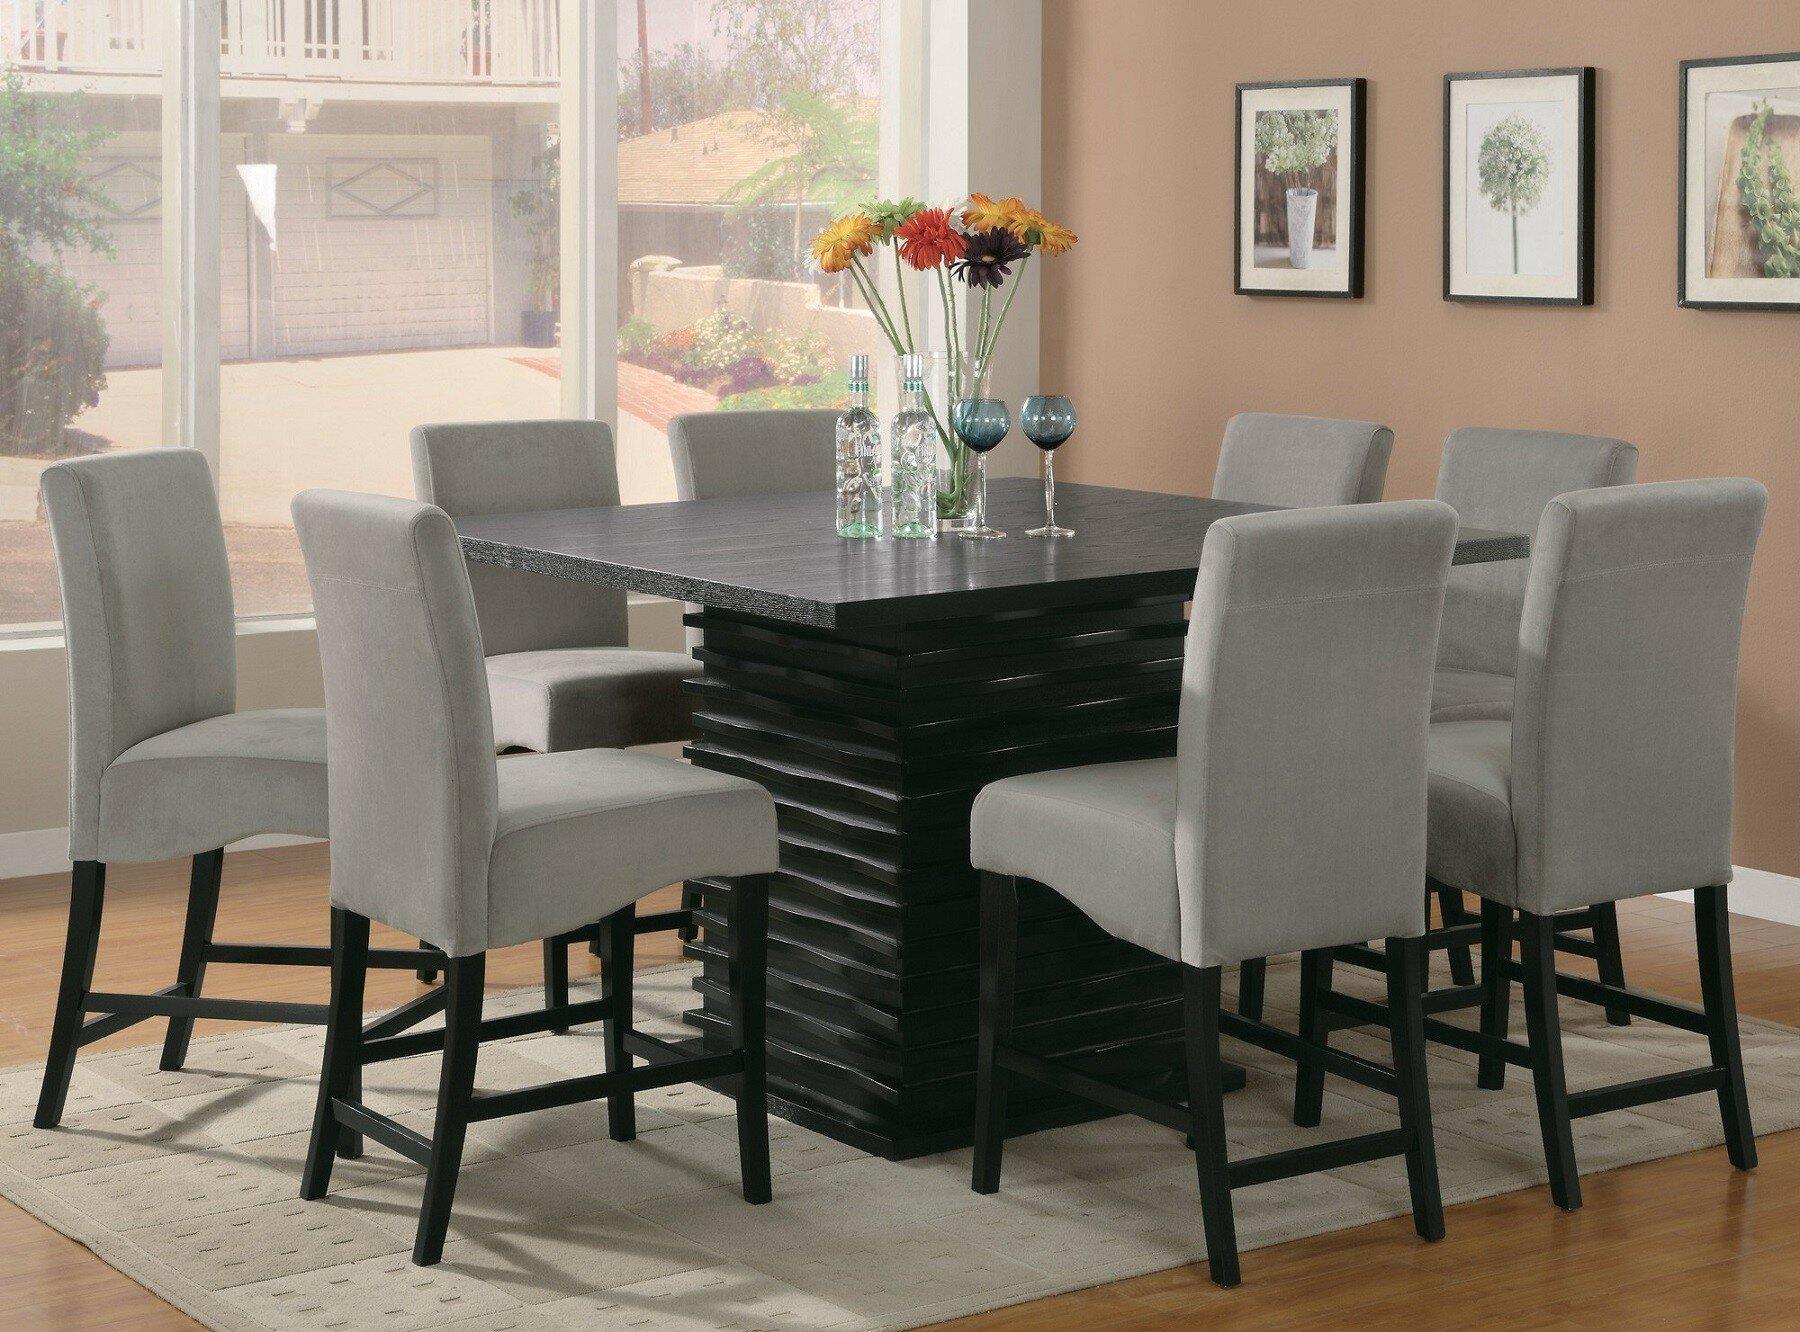 Awesome Infini Furnishings Jordan 9 Piece Counter Height Dining Set U0026 Reviews |  Wayfair